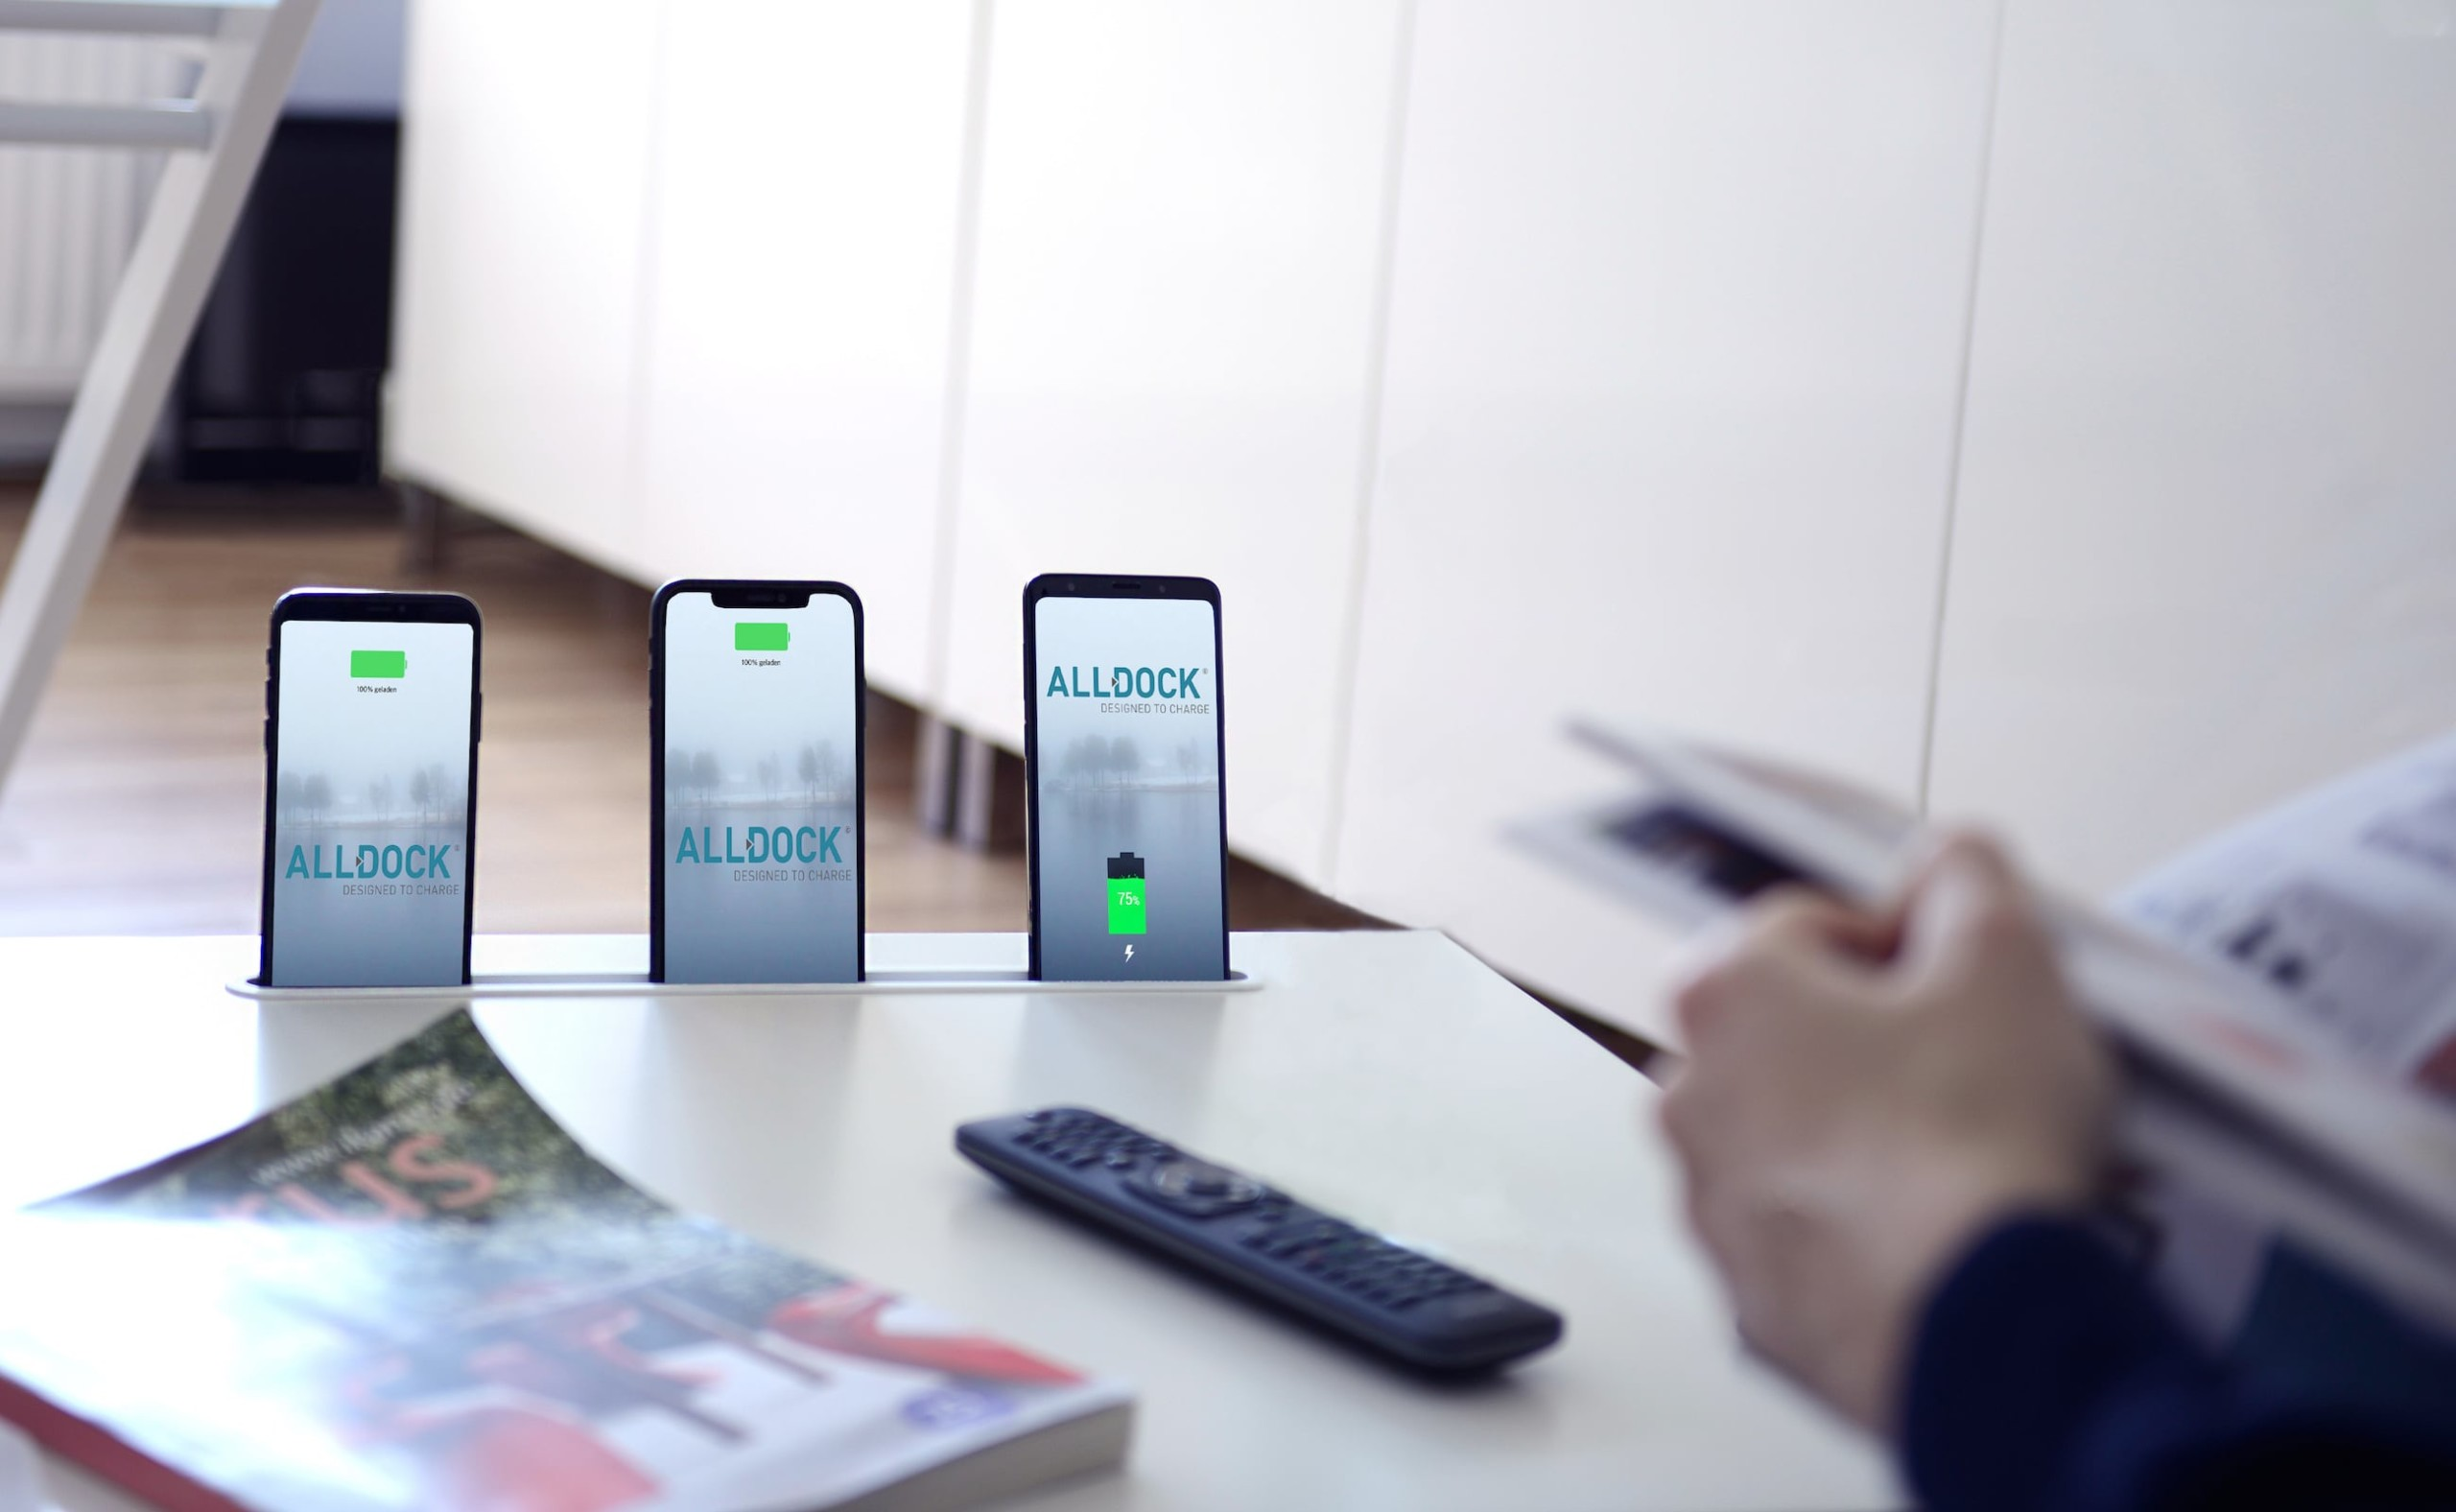 Alldock Integrate Built-In Charging Dock works with all common smartphones